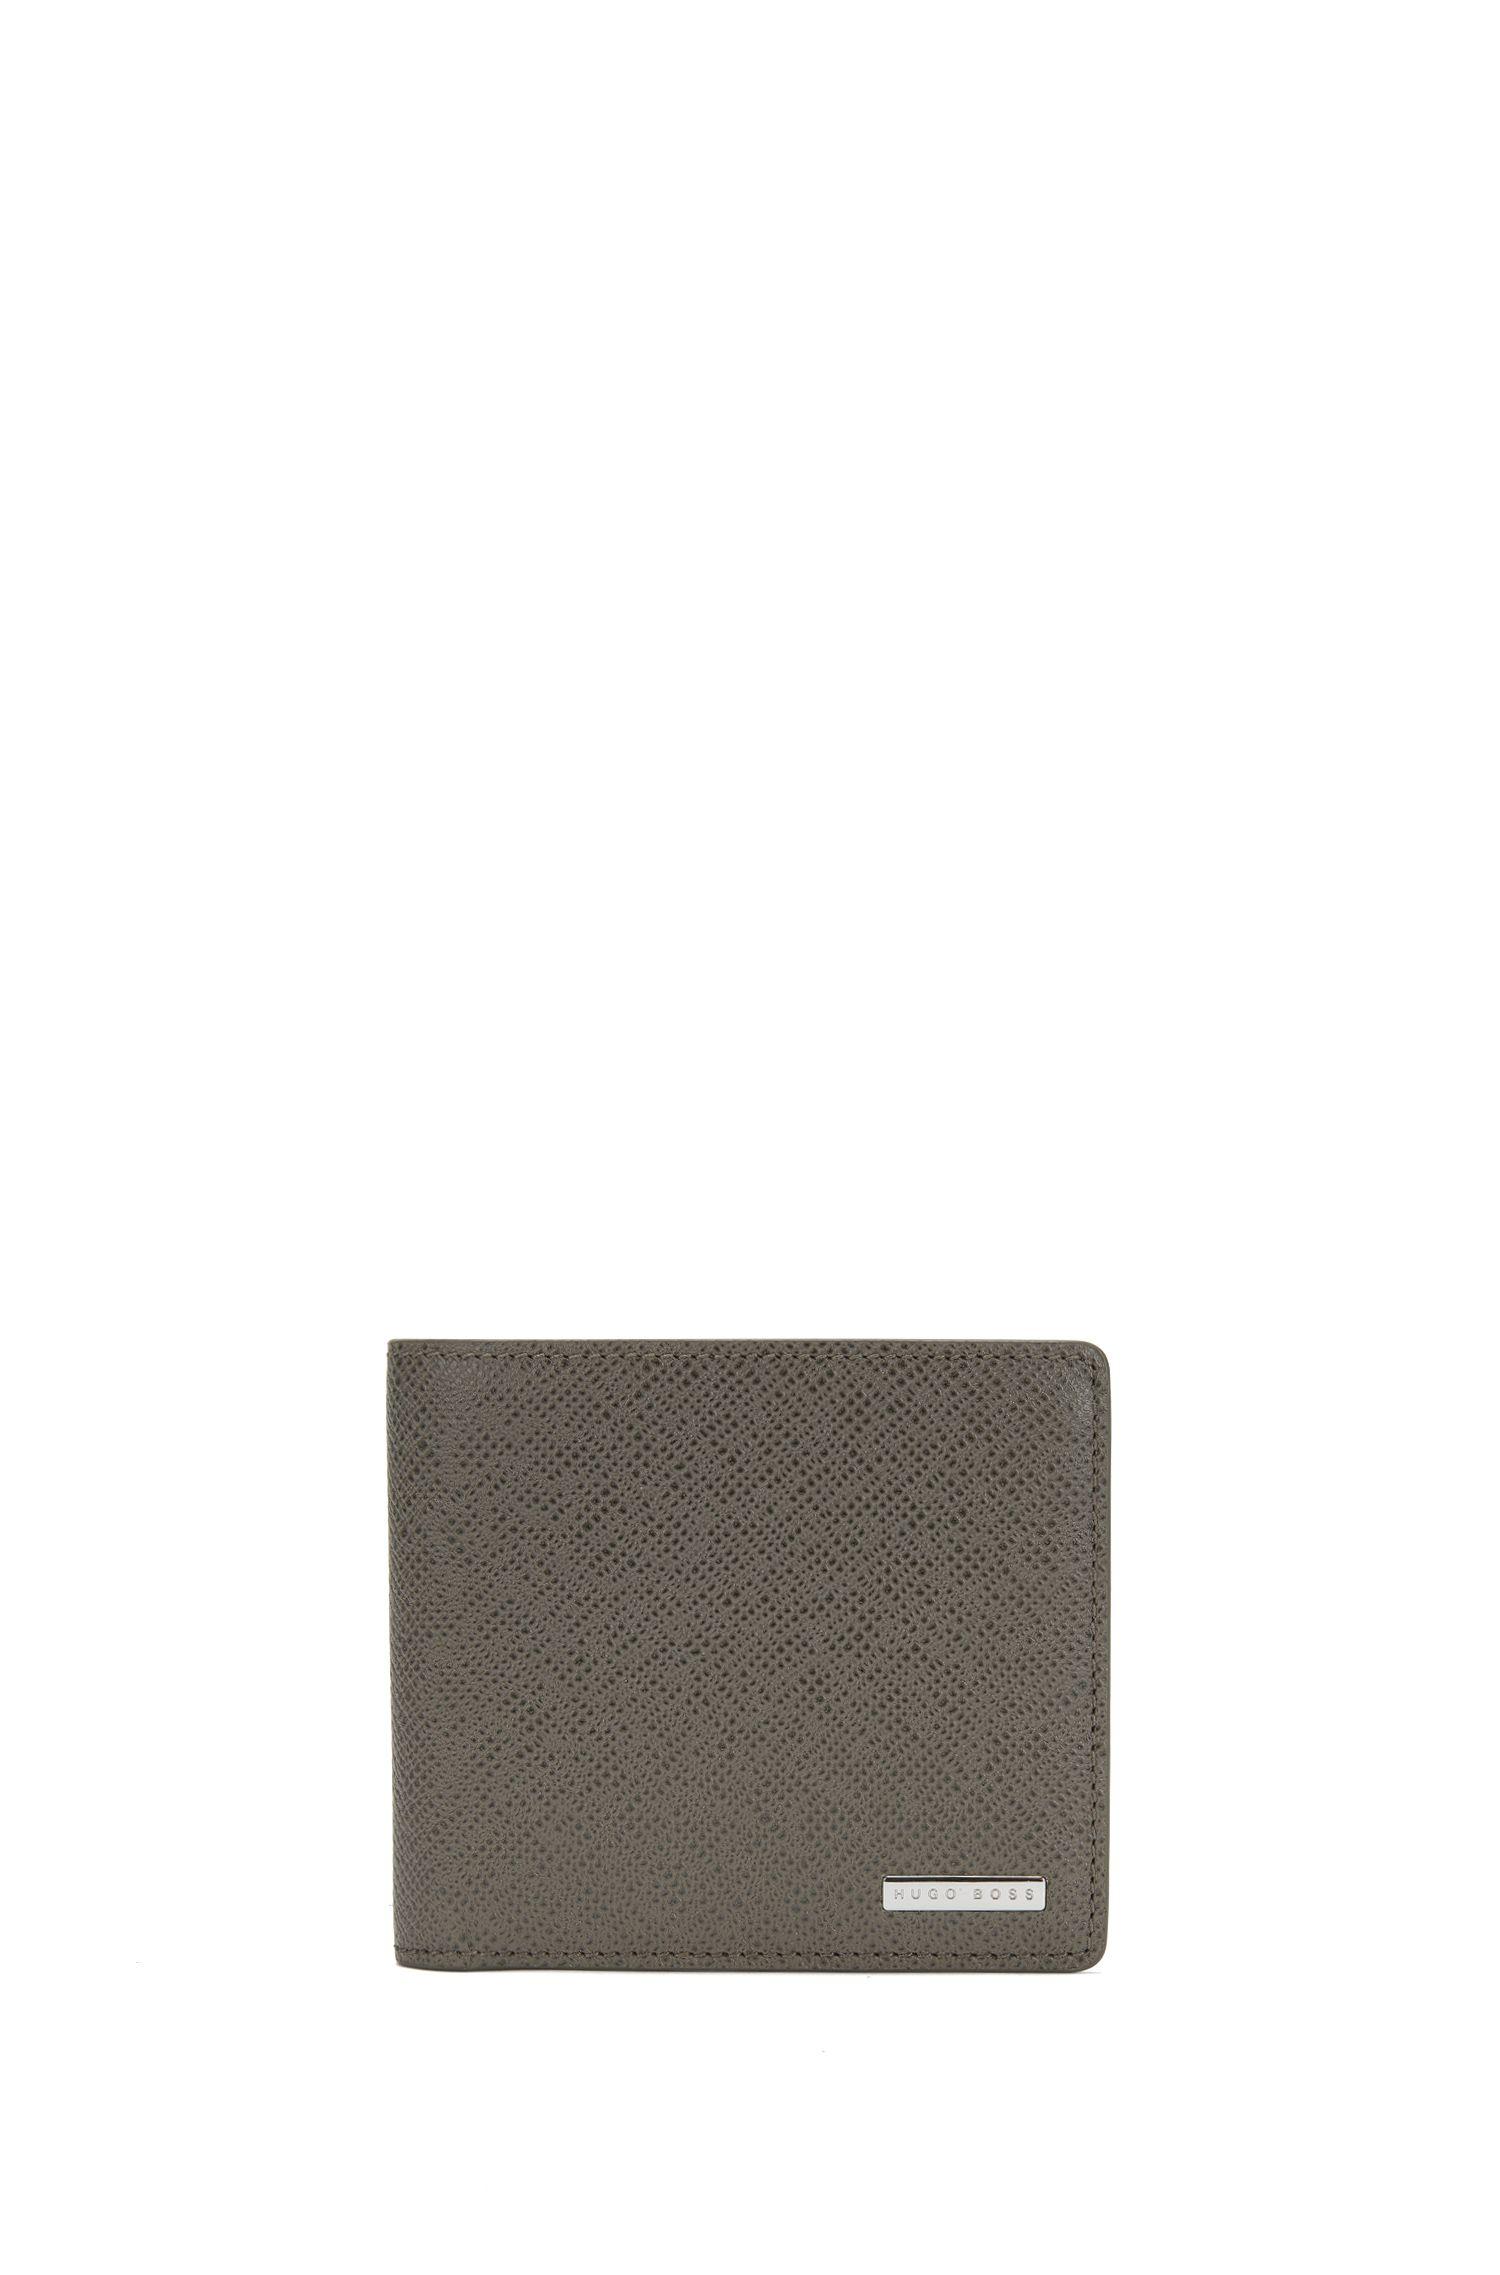 'Signature Coin' | Calfskin Pebbled Wallet